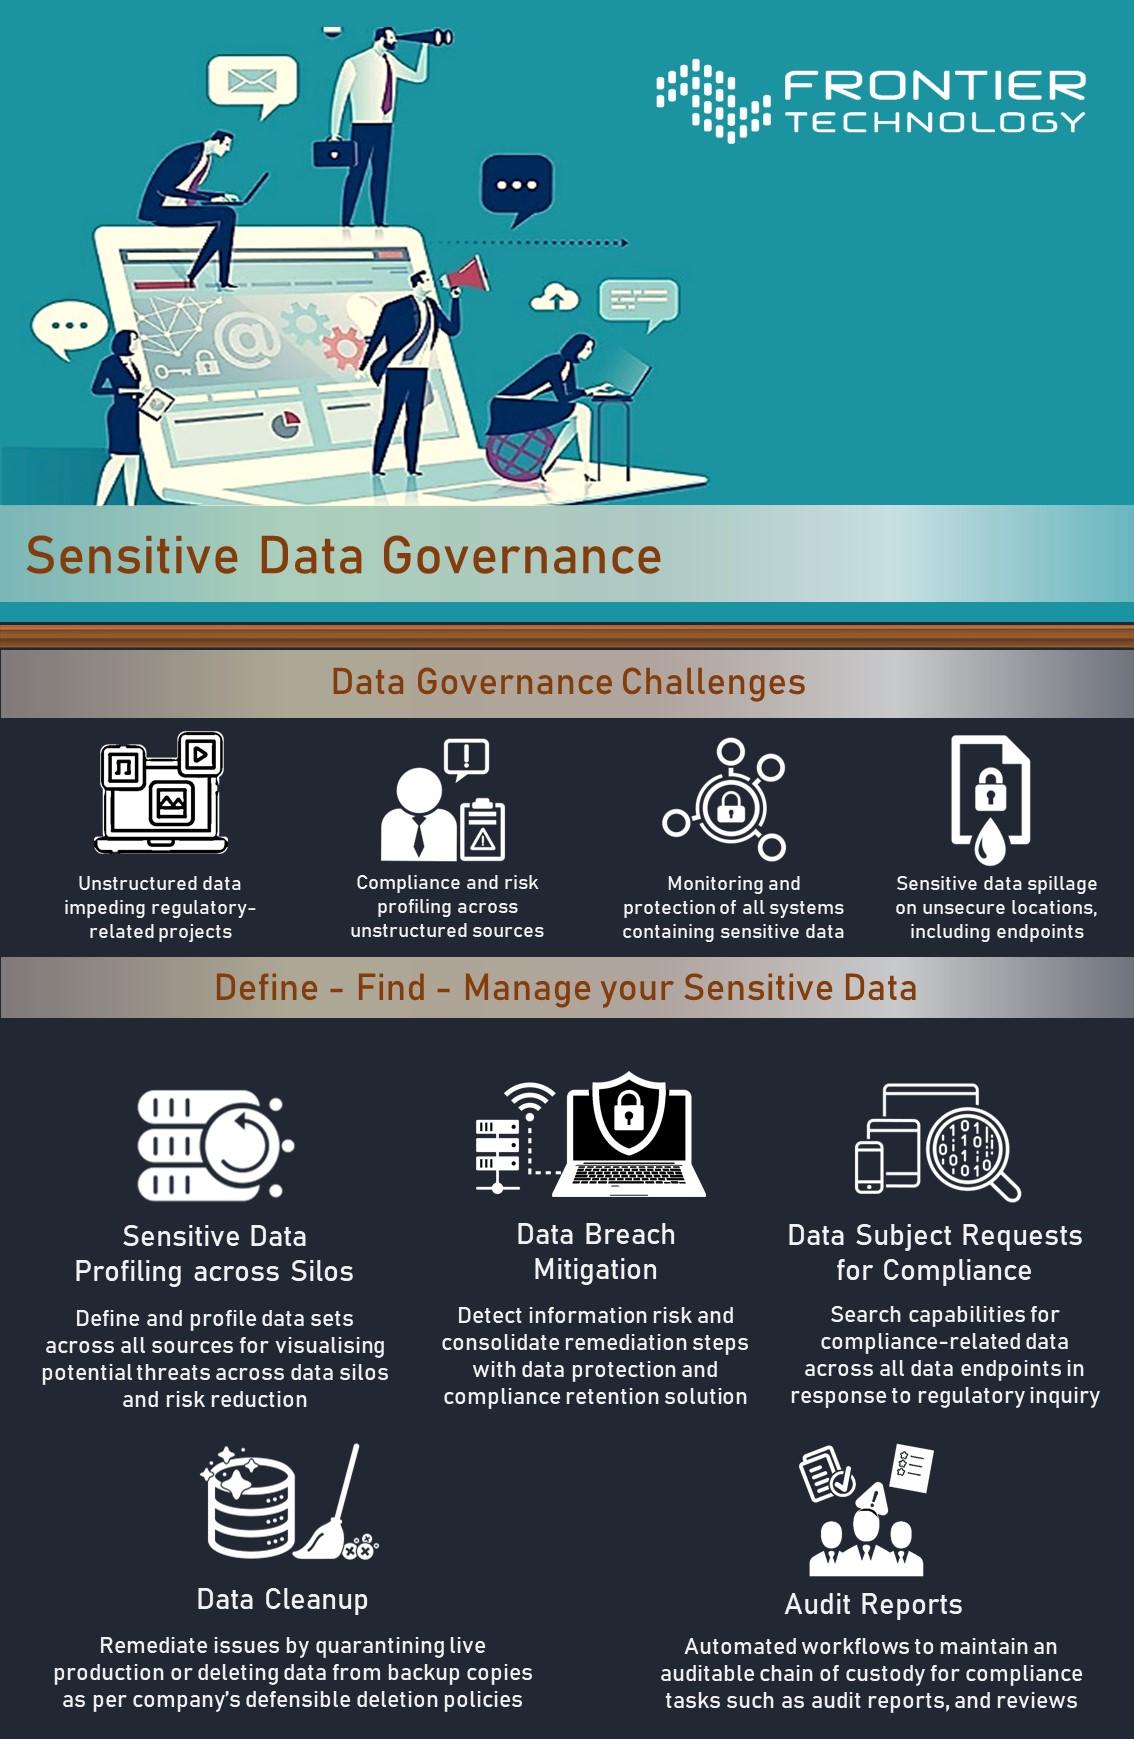 Sensitive Data Governance